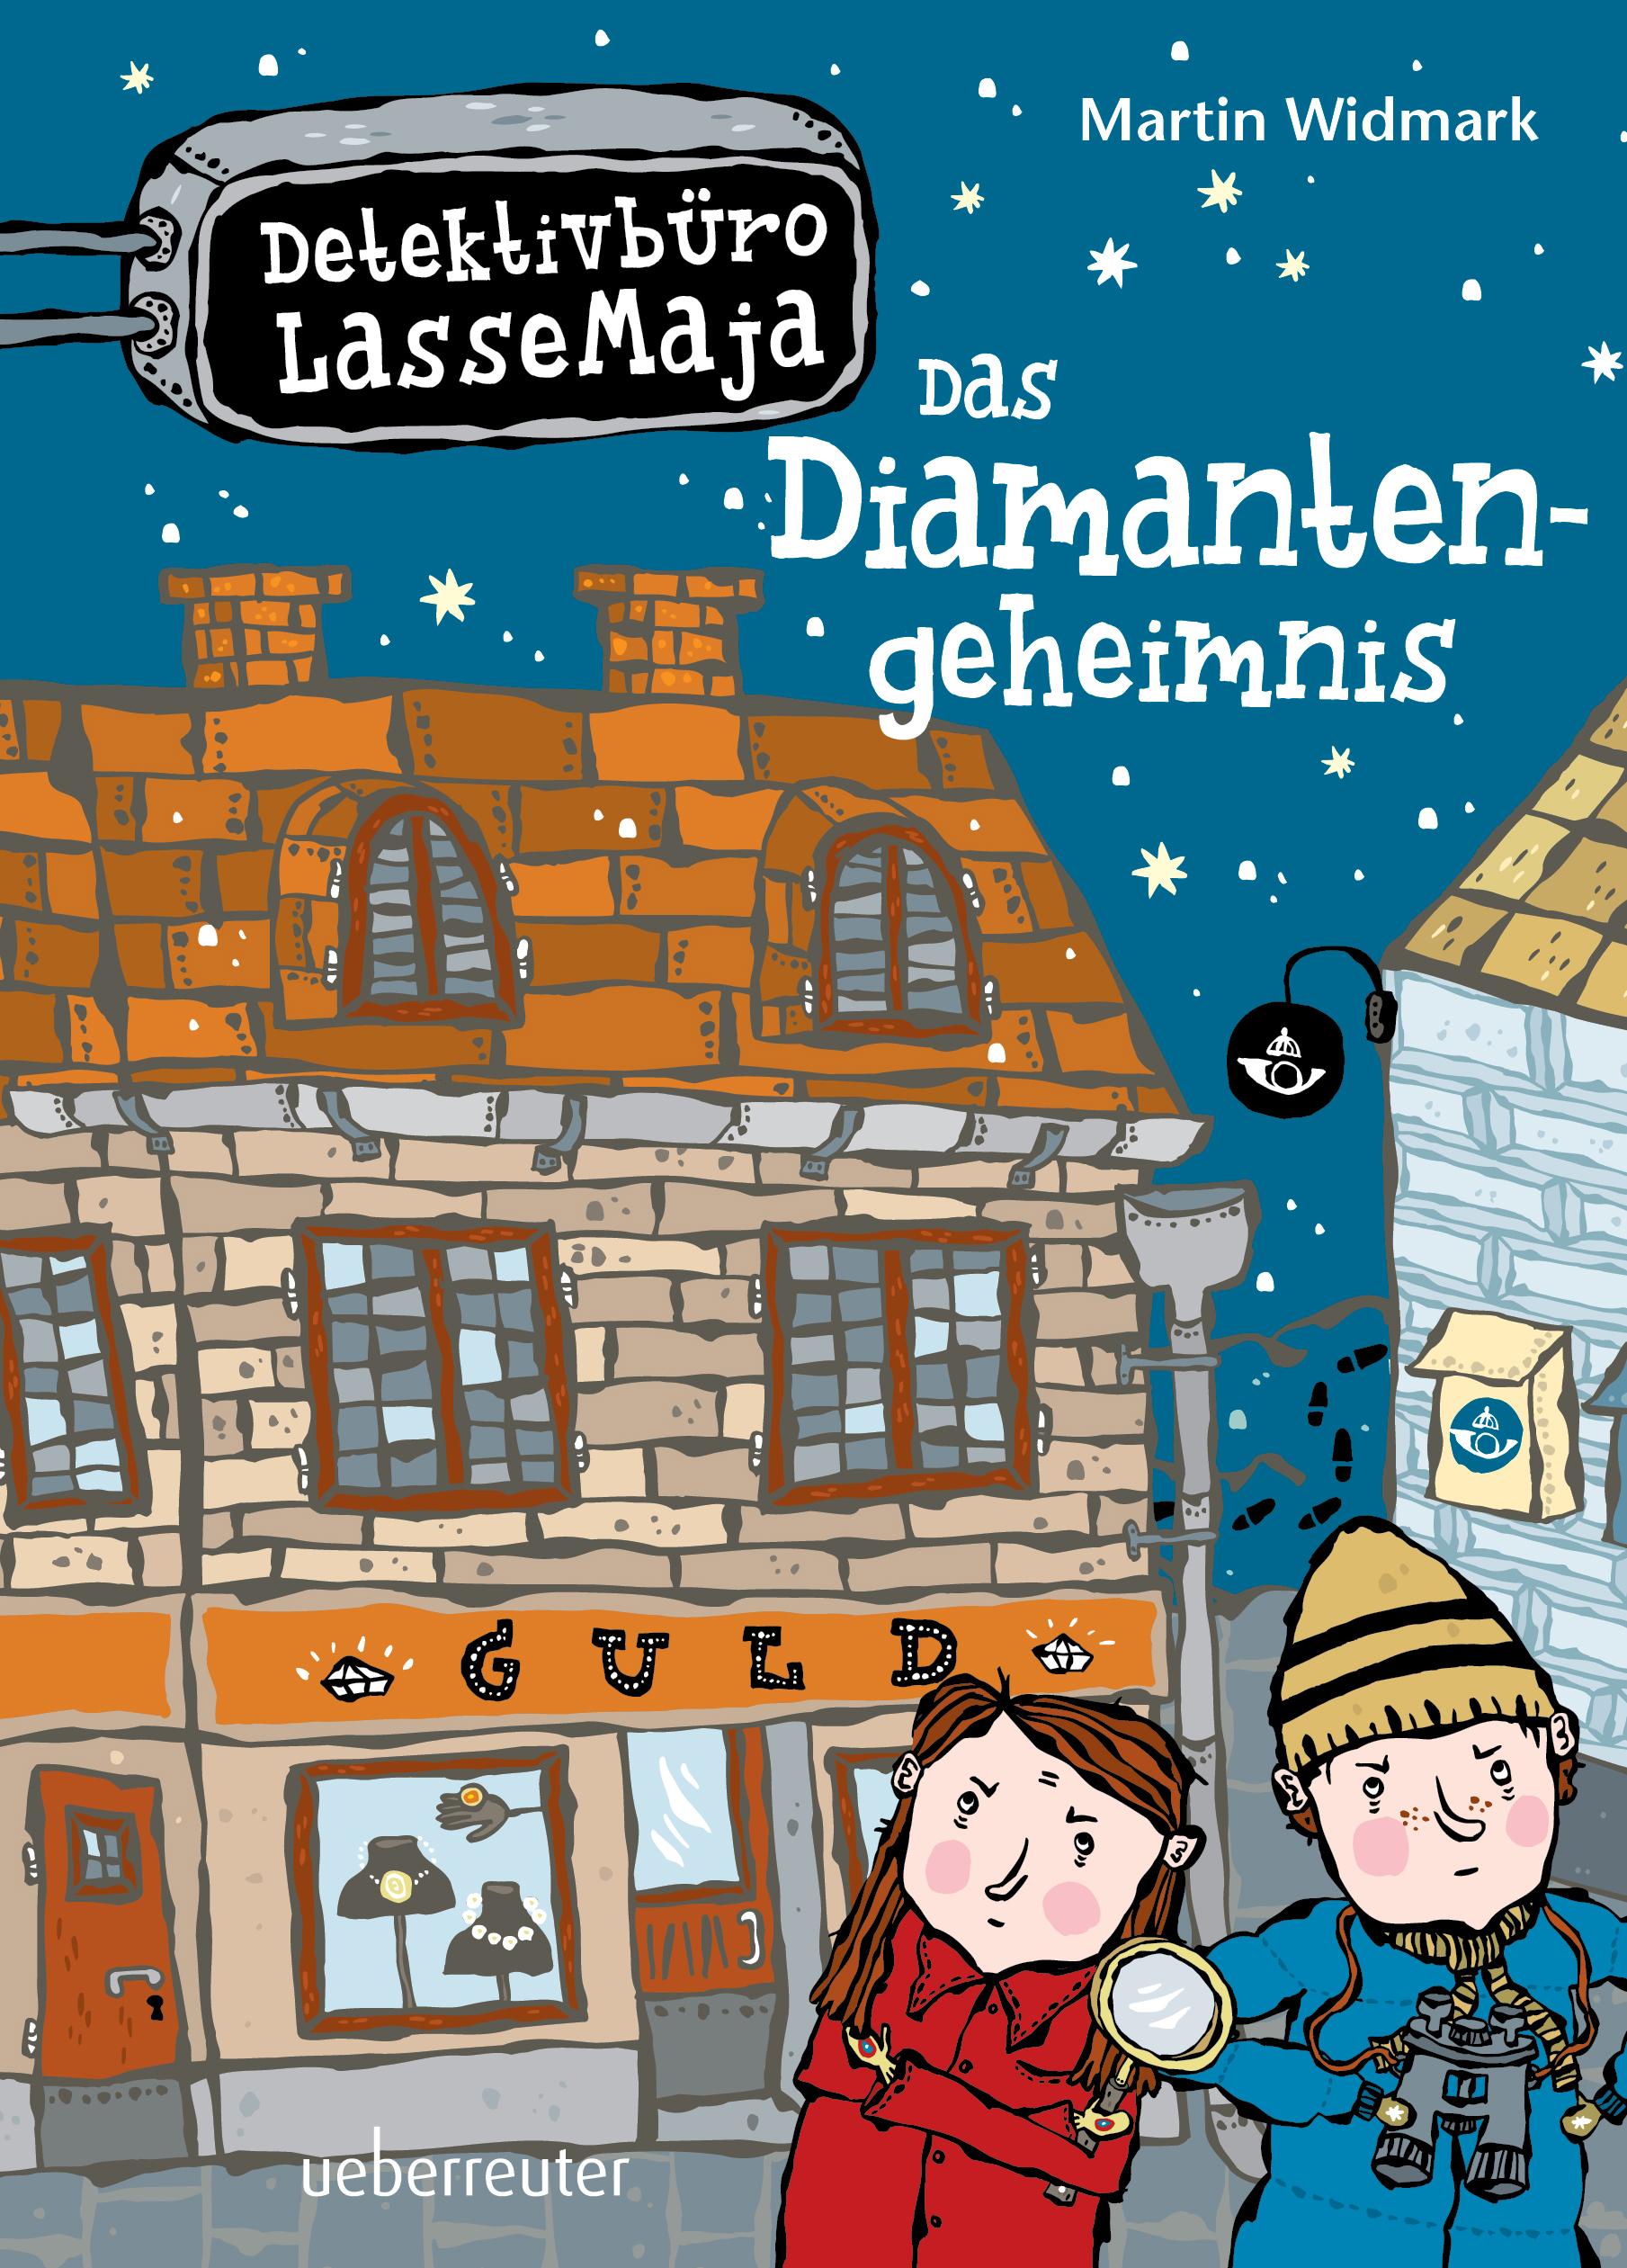 Detektivbüro LasseMaja – Das Diamantengeheimnis